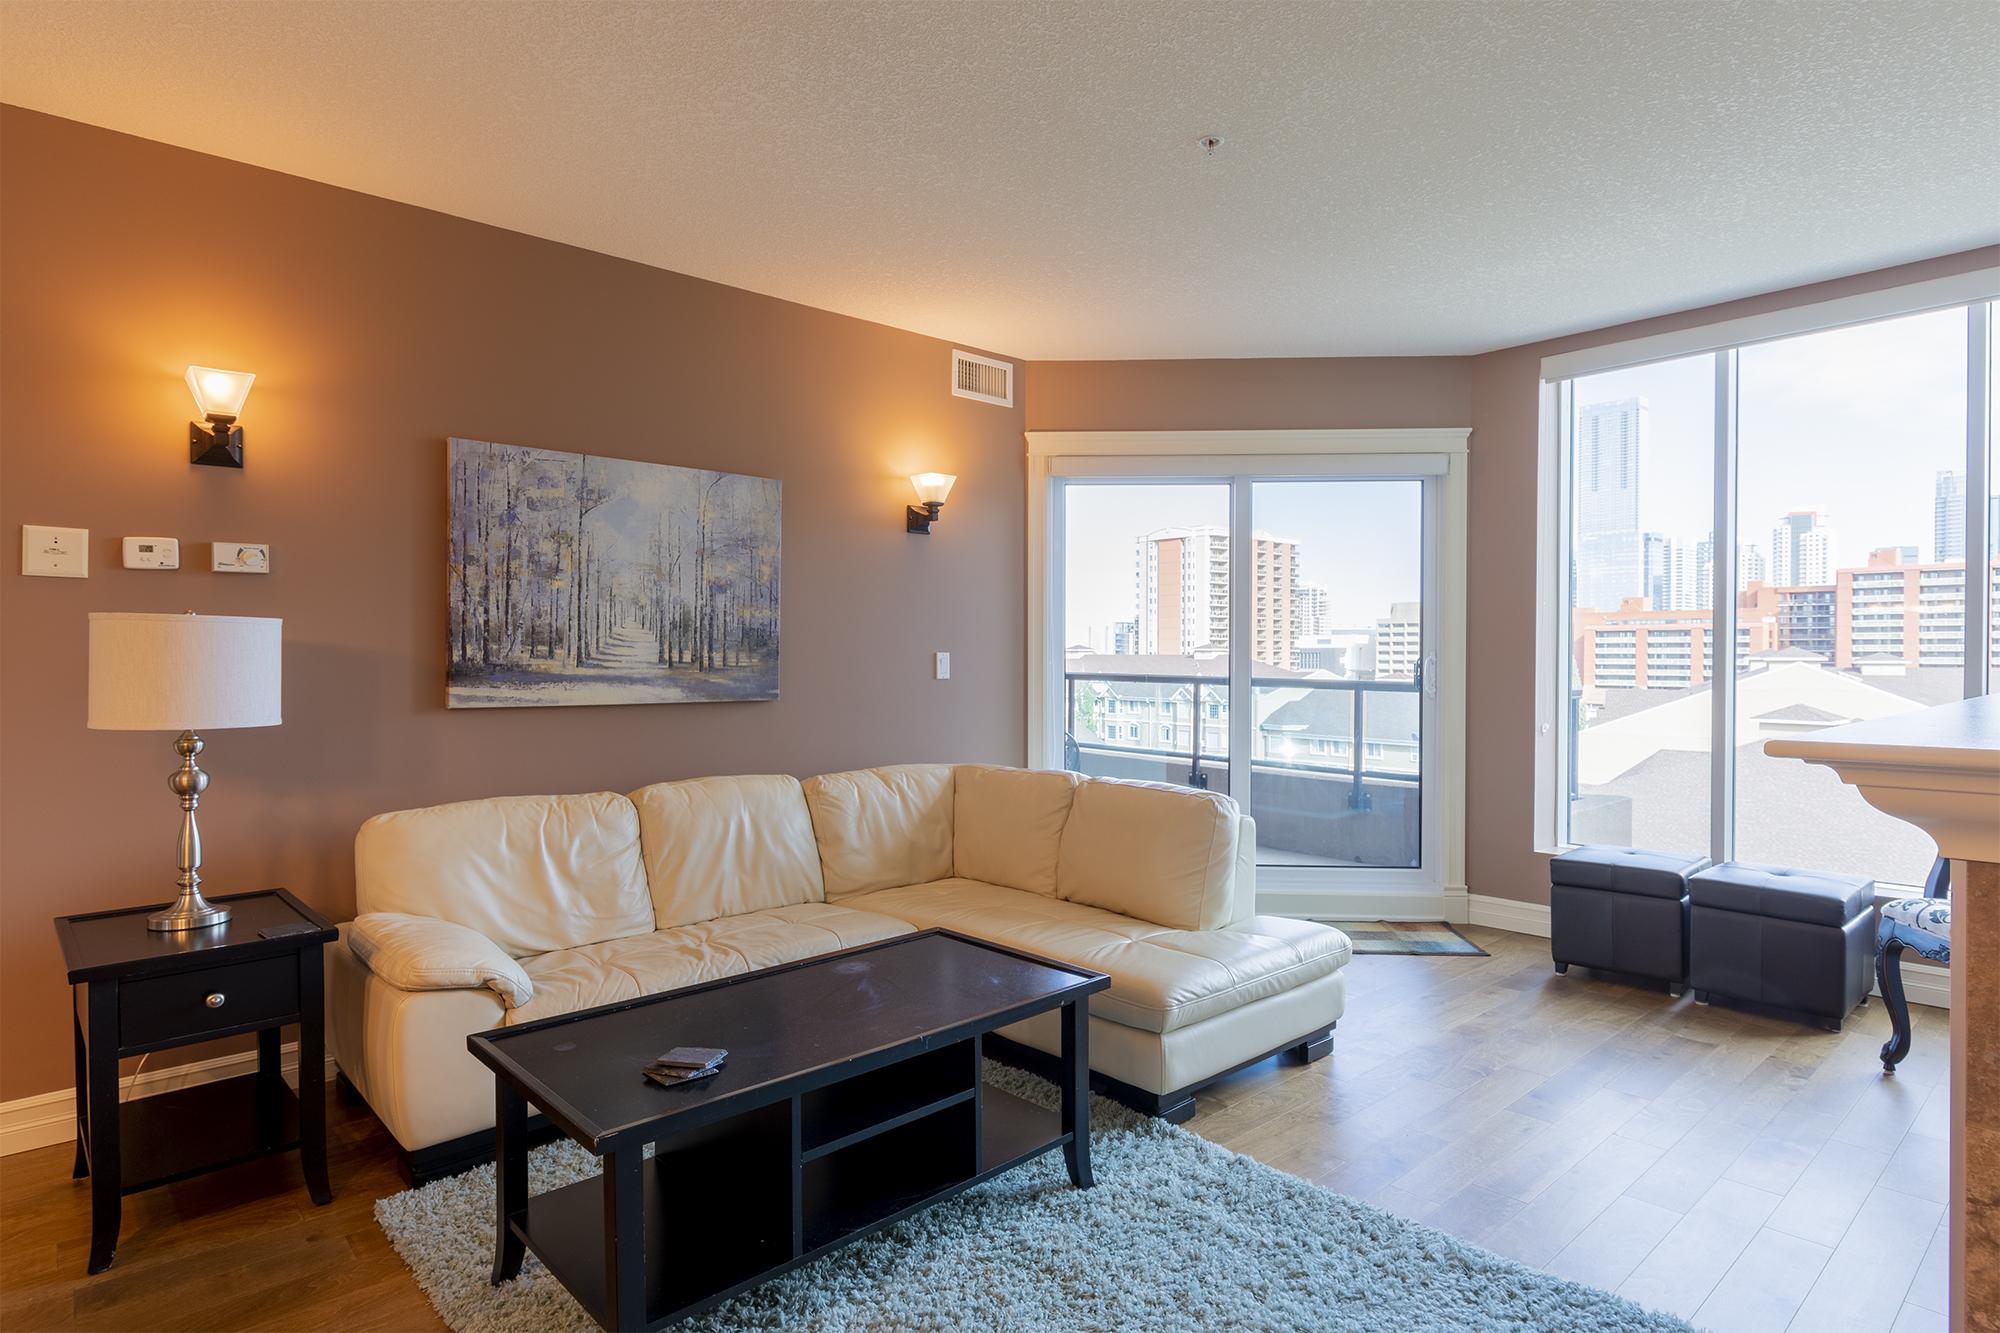 MHA_Meridian_2020_Living Room_2